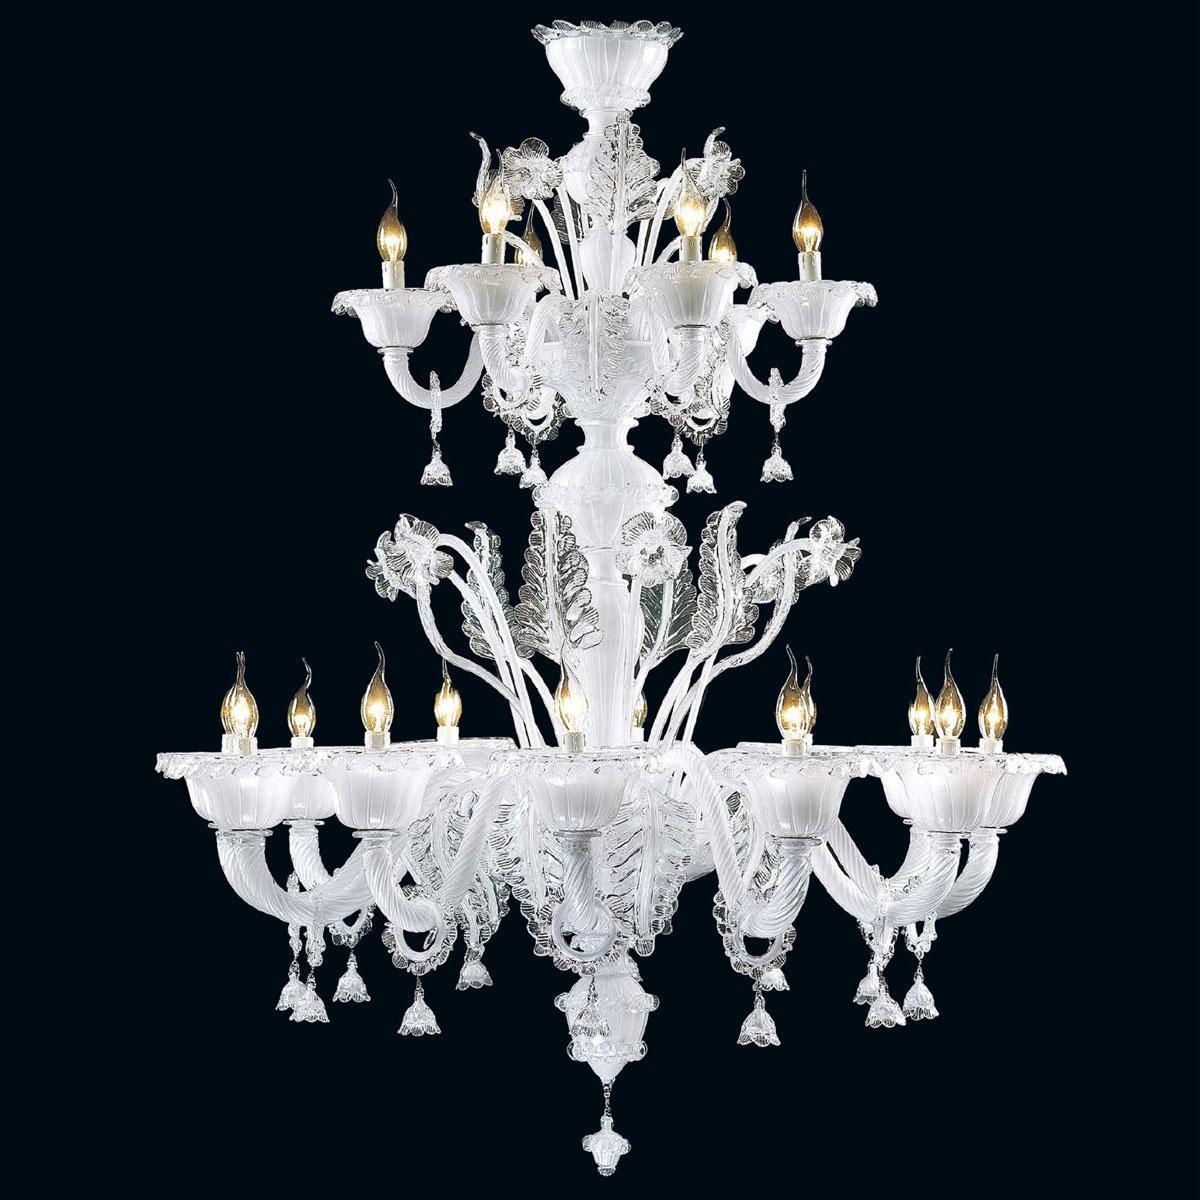 """Zenia"" Murano glass chandelier - 12+6 lights - white"